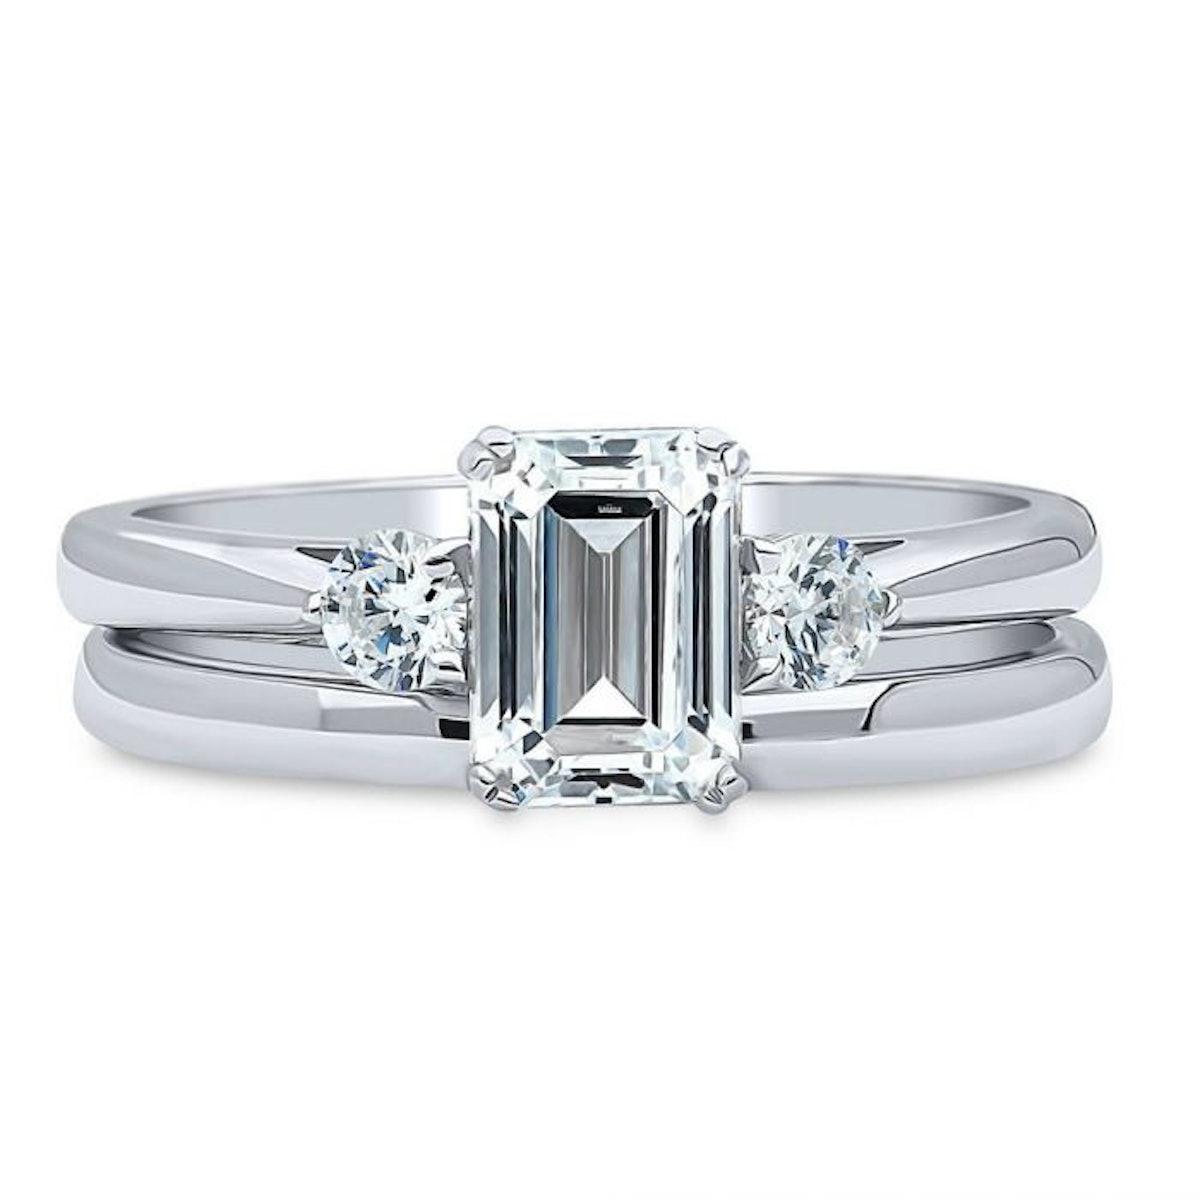 Sterling Silver Ring with Swarovski Zirconia